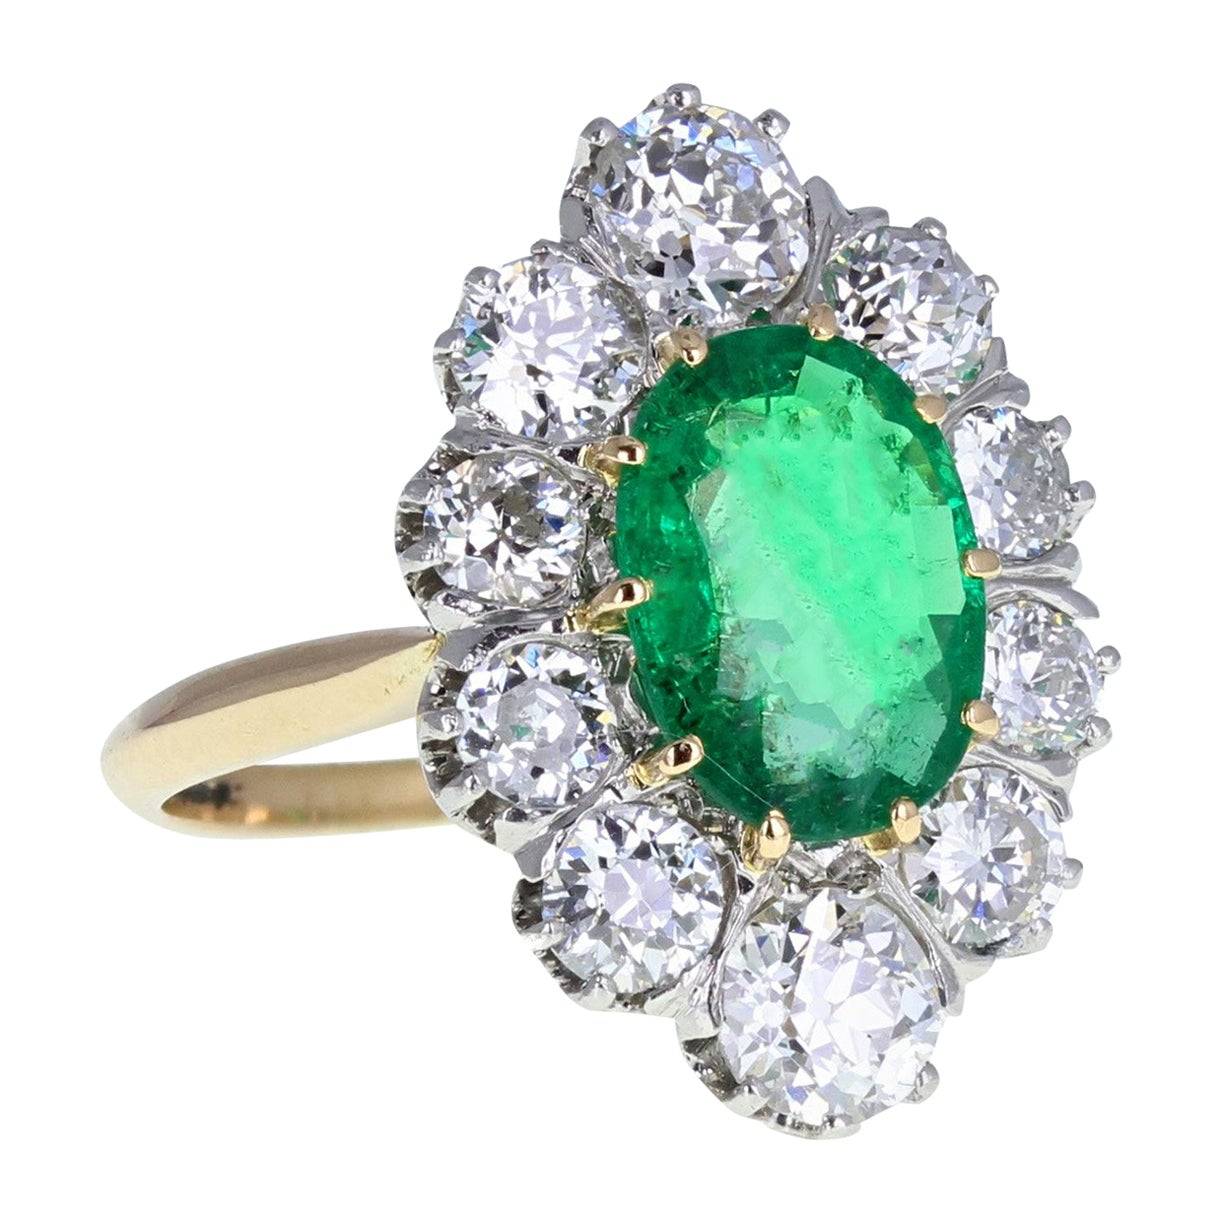 Antique 18 Carat Gold Platinum Oval Emerald Diamond Navette Cluster Ring